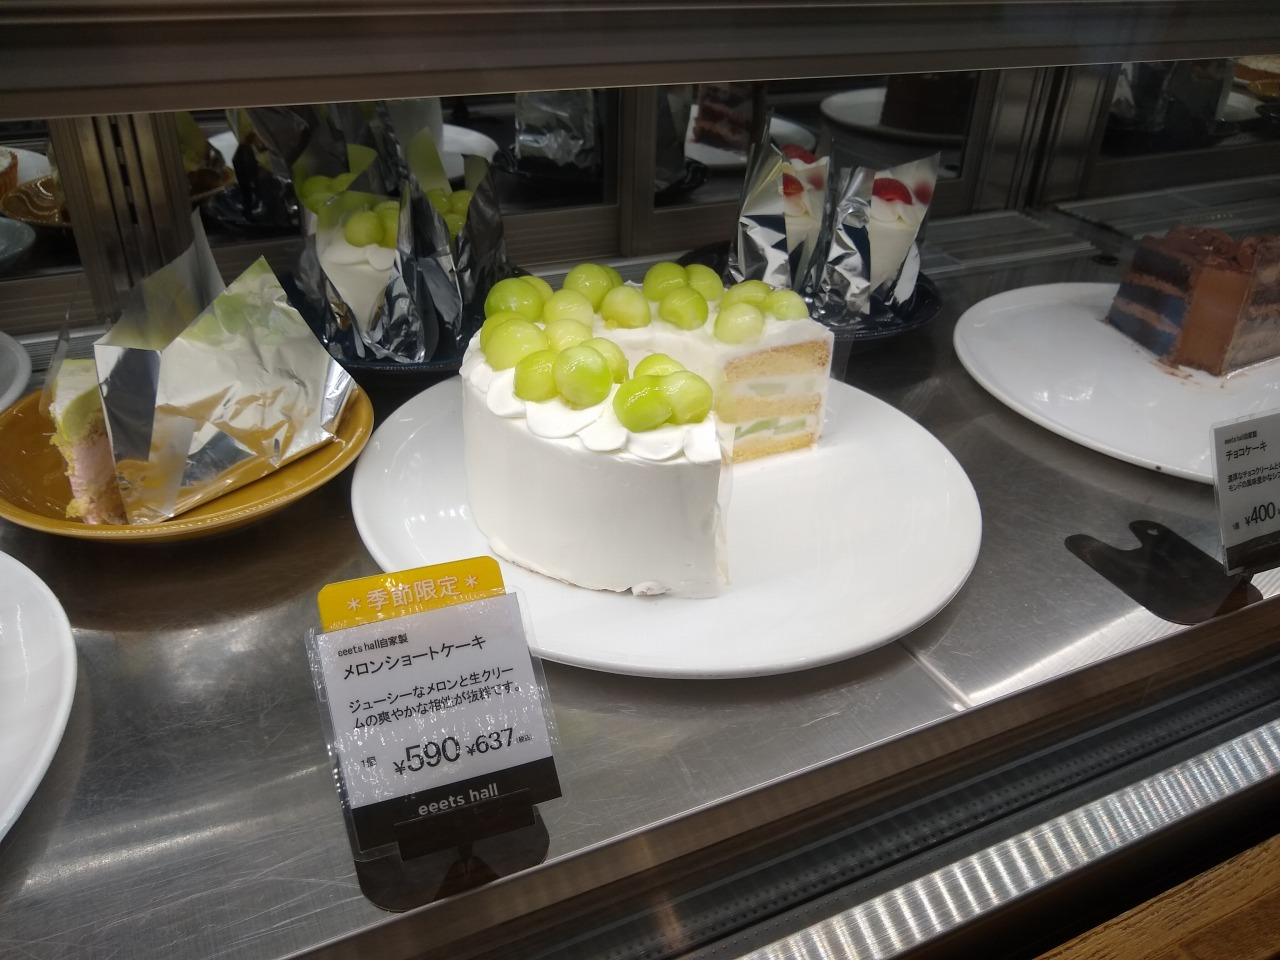 eeetshallの期間限定ケーキ(メロン)